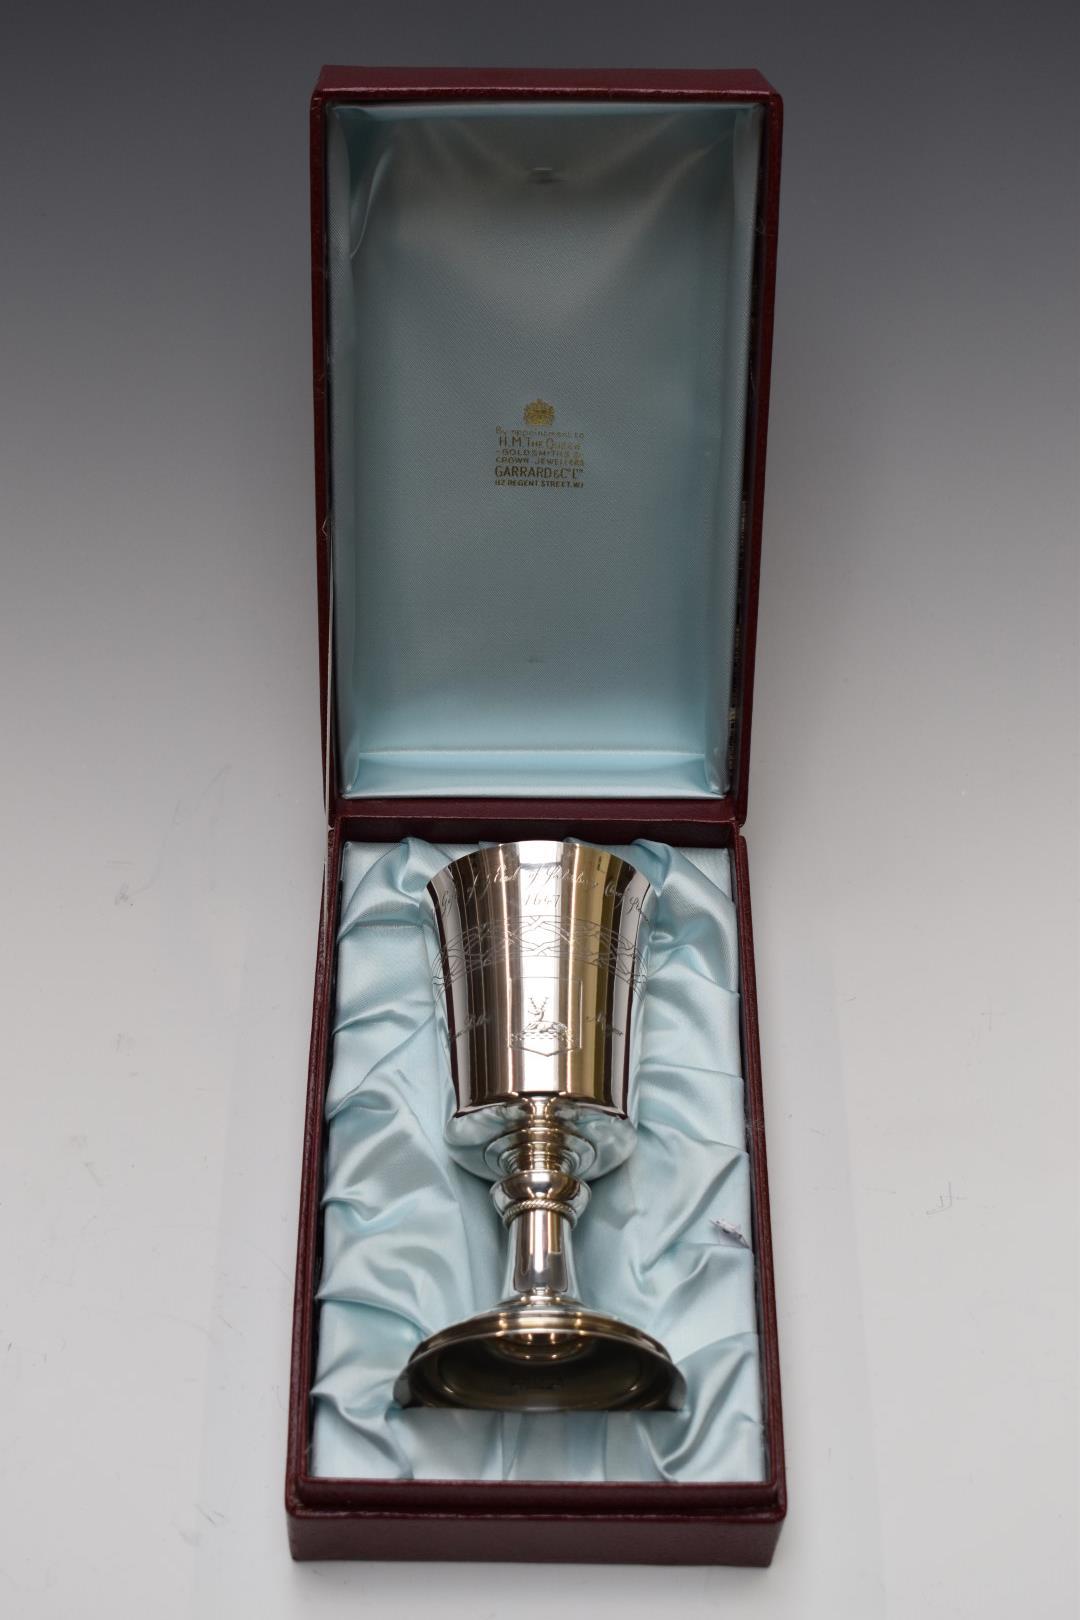 Garrard & Co. Ltd boxed hallmarked silver limited edition (782/1300) commemorative Hertford